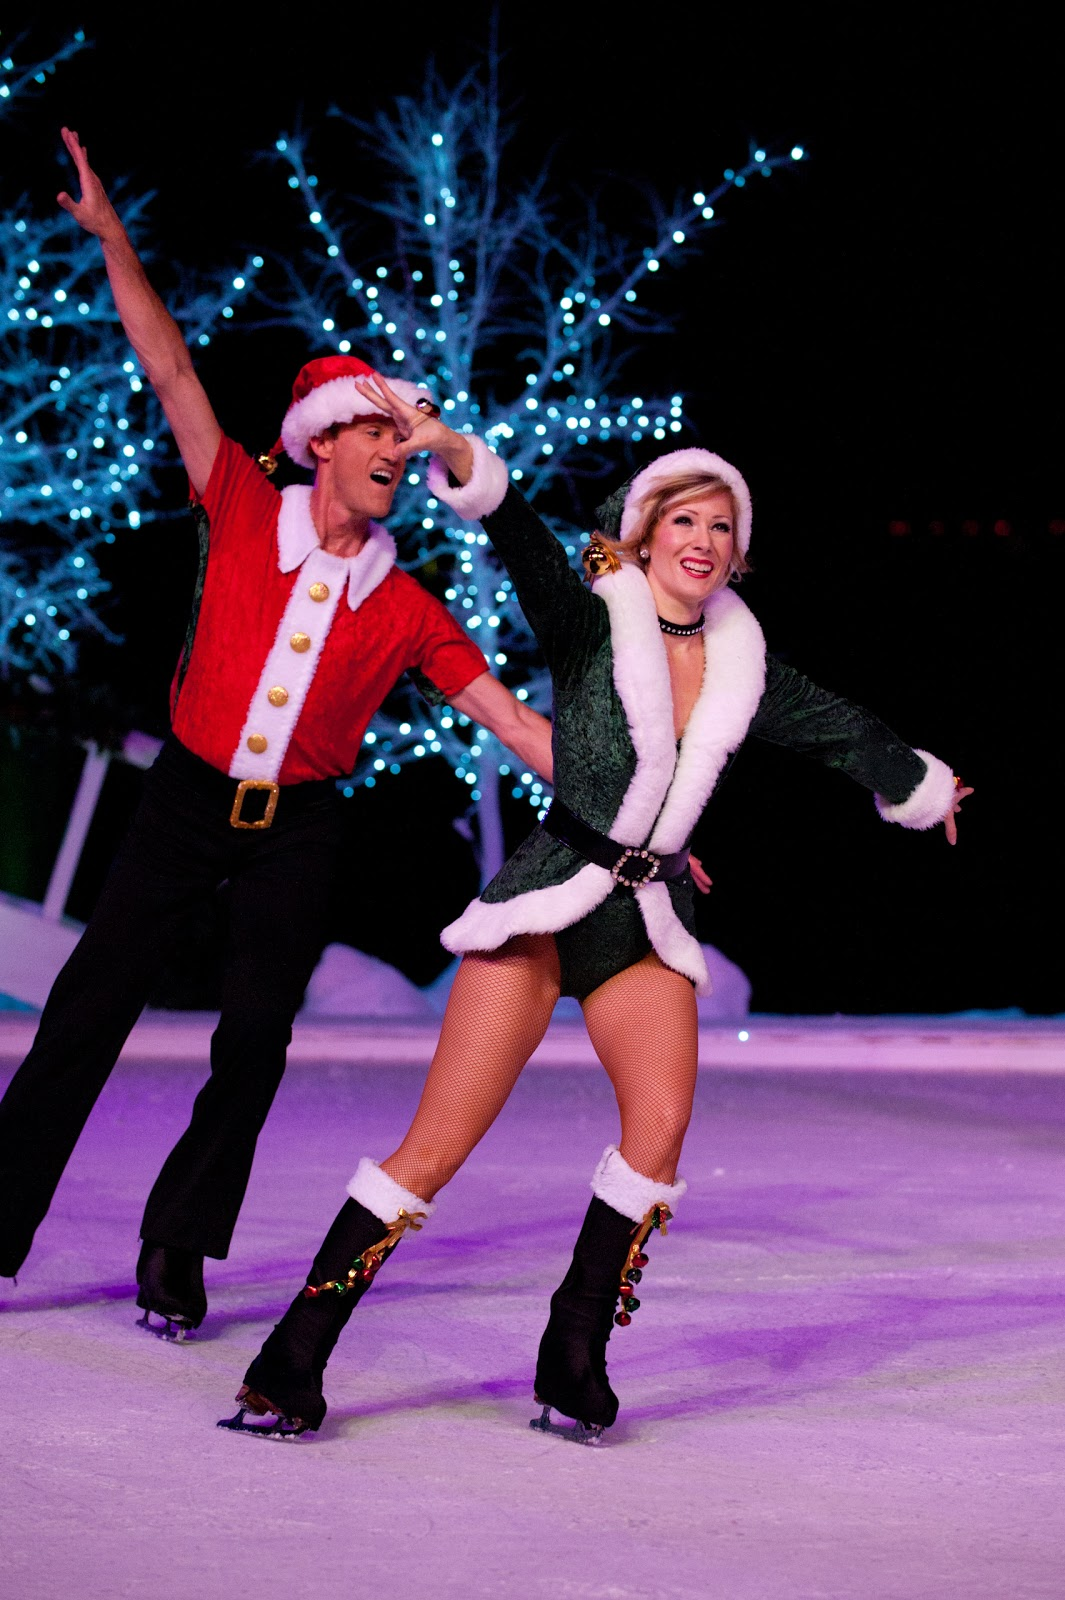 christmas celebration, christmas celebration clip art, family christmas celebration, christmas celebration mannheim, cartoon christmas celebration-37